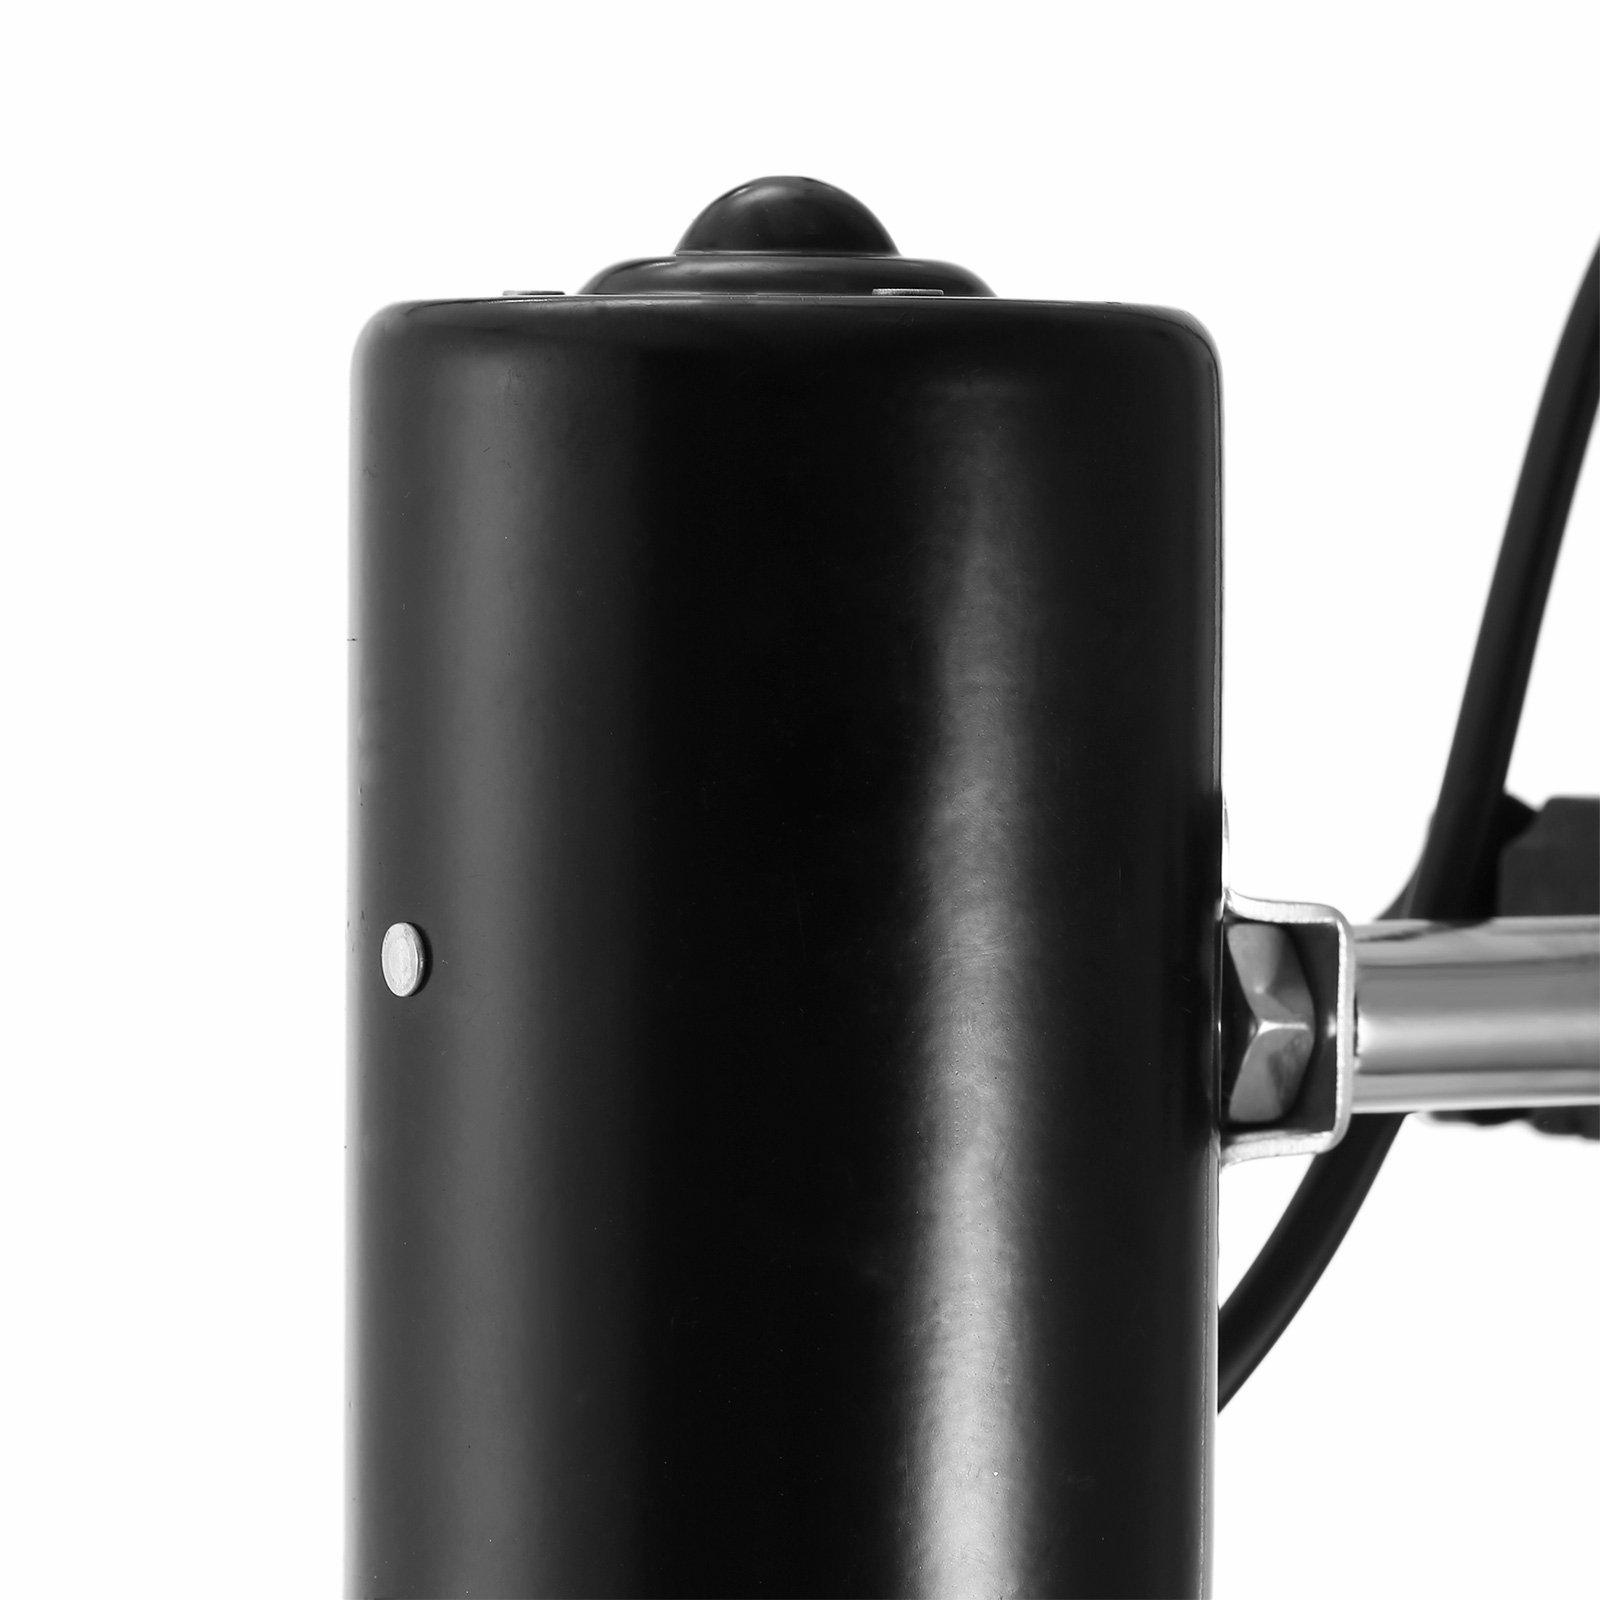 Mophorn Electric Overhead Stirrer Mixer 0-2000 RPM Overhead Stirrer Mixer 100W Lab Mixer Blender Variable Speed 0-120 Minutes Overhead Stirrer by Mophorn (Image #5)